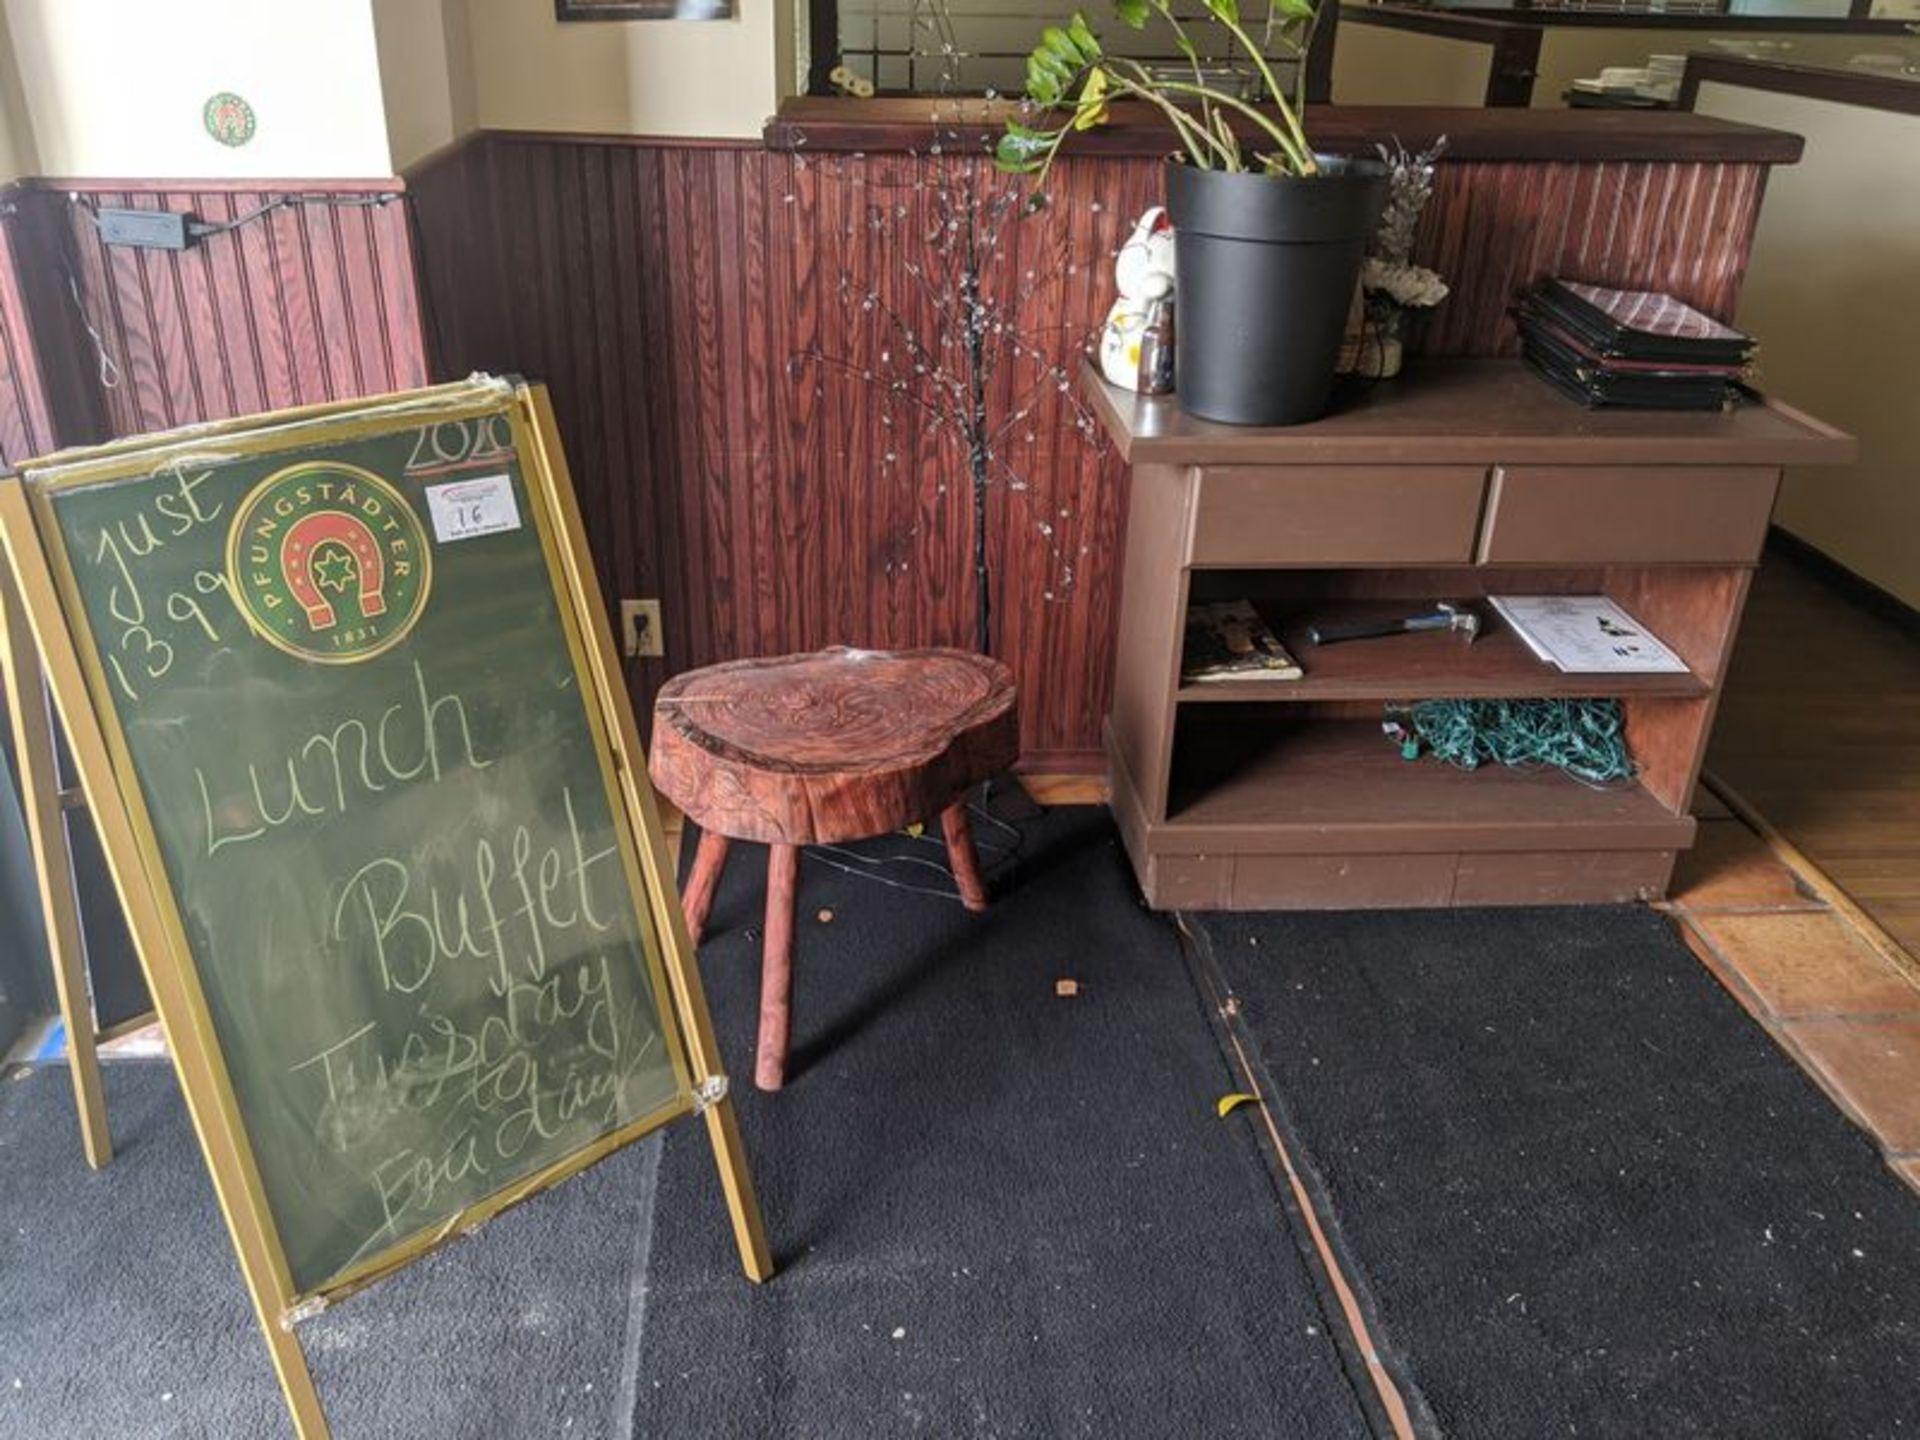 Lot 16 - Folding Sandwich Board and Hostess Stand